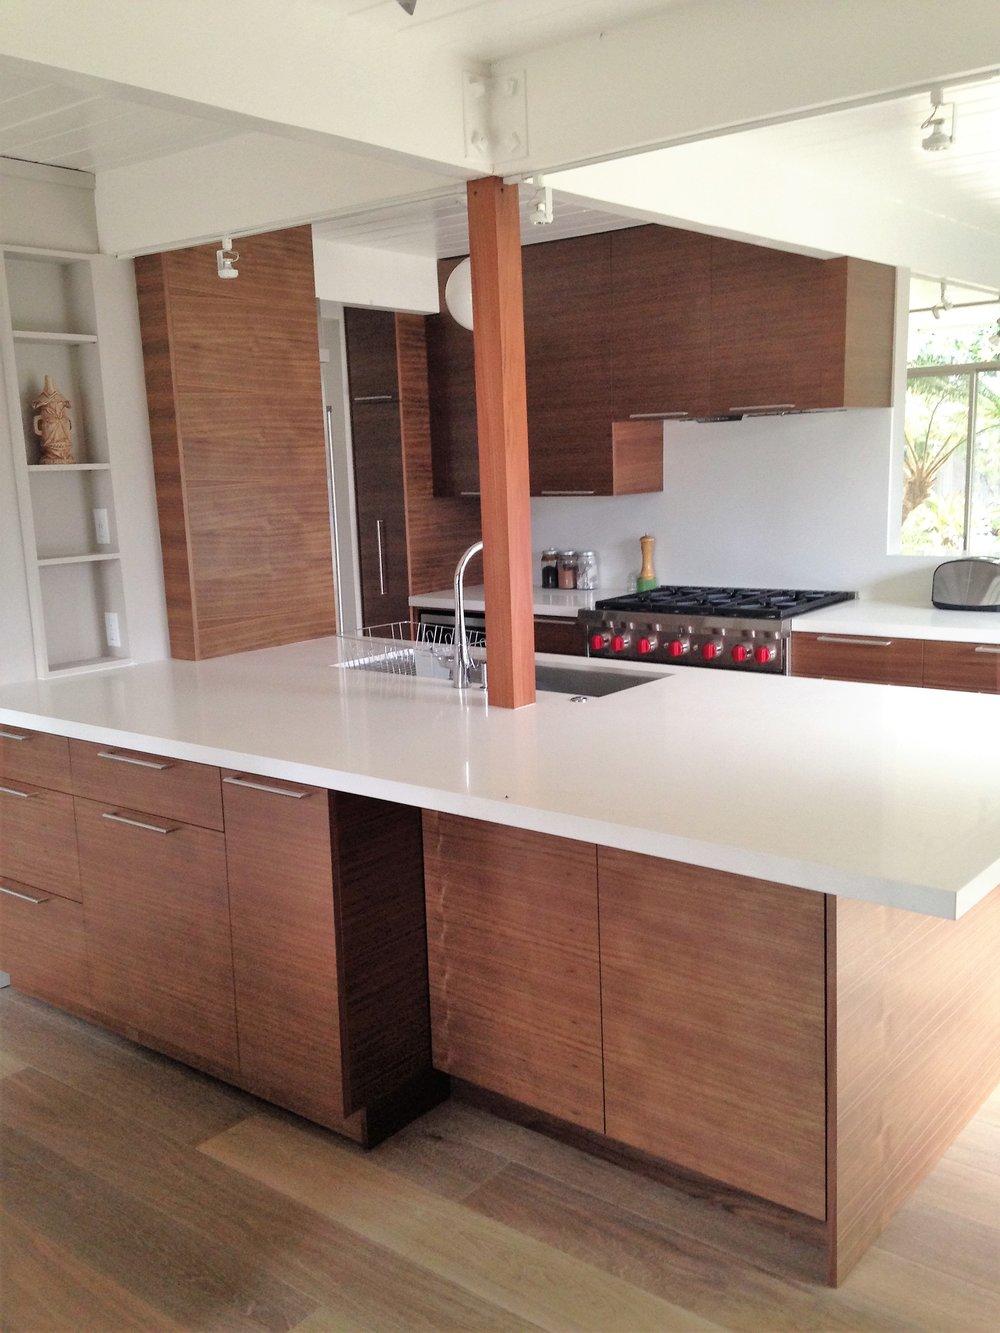 Mid Century Modern Kitchen Remodel - San Rafael, CA